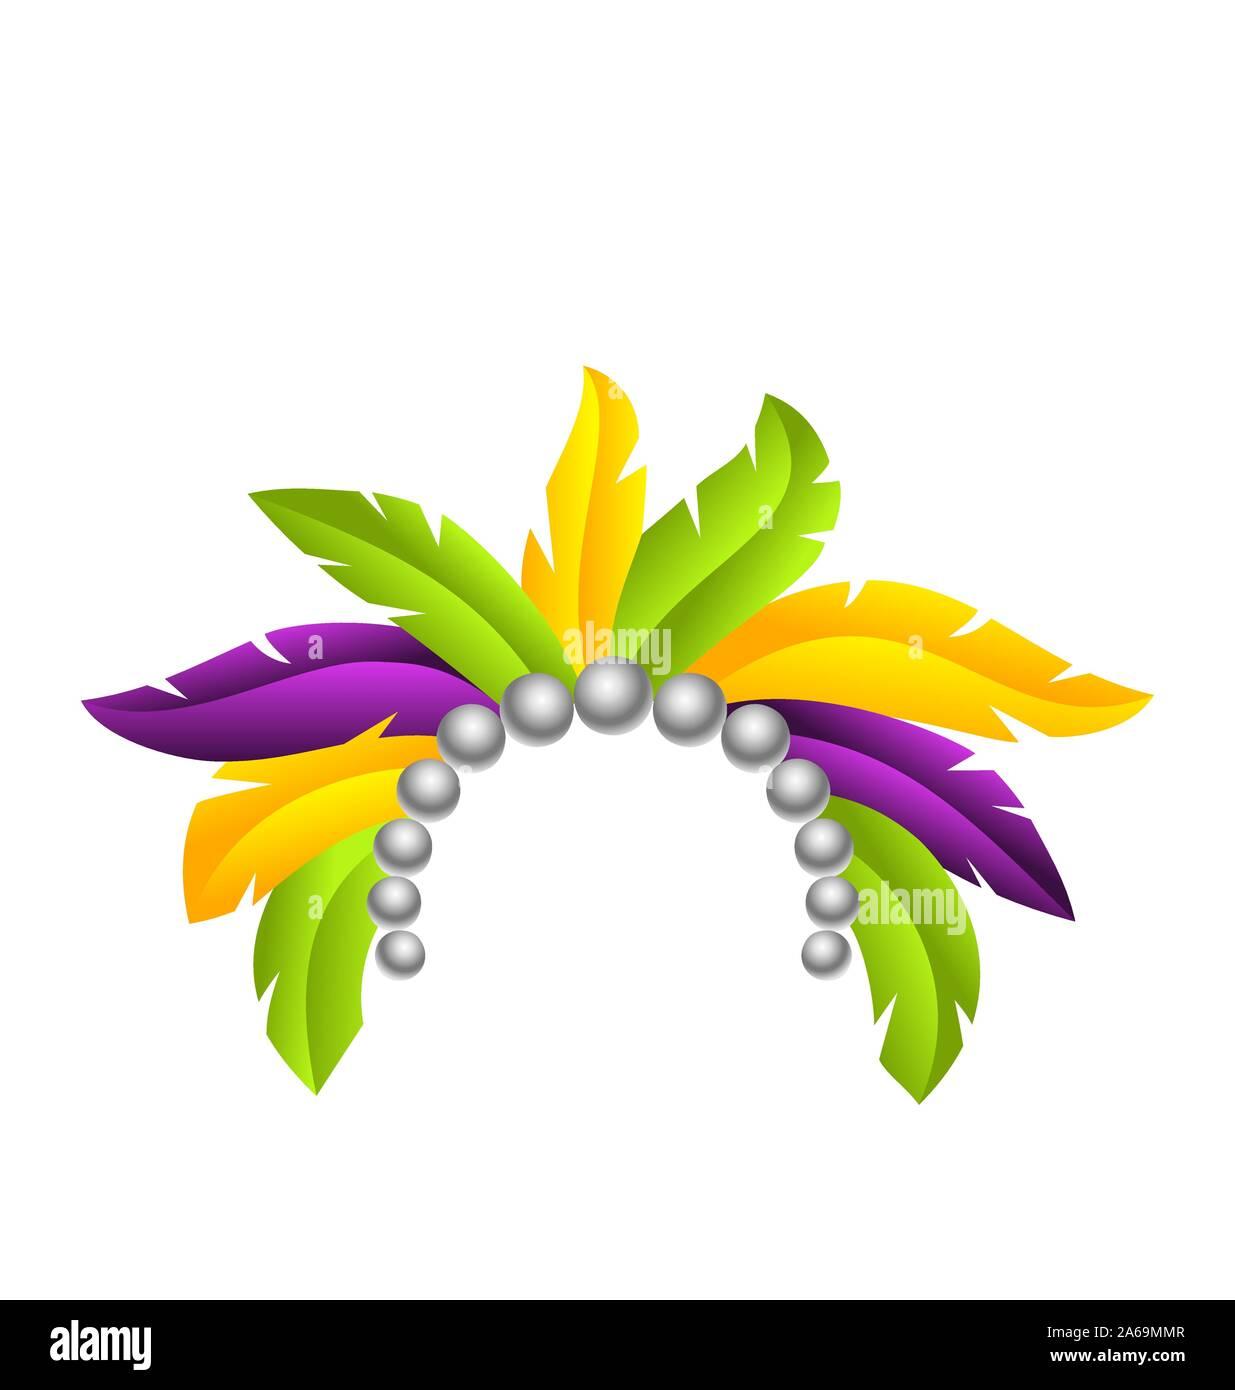 Mardi Gras Feather Headband, Headdress with Pearls, Headpiece Carnaval, Festival Headwear - Illustration Vector Stock Vector